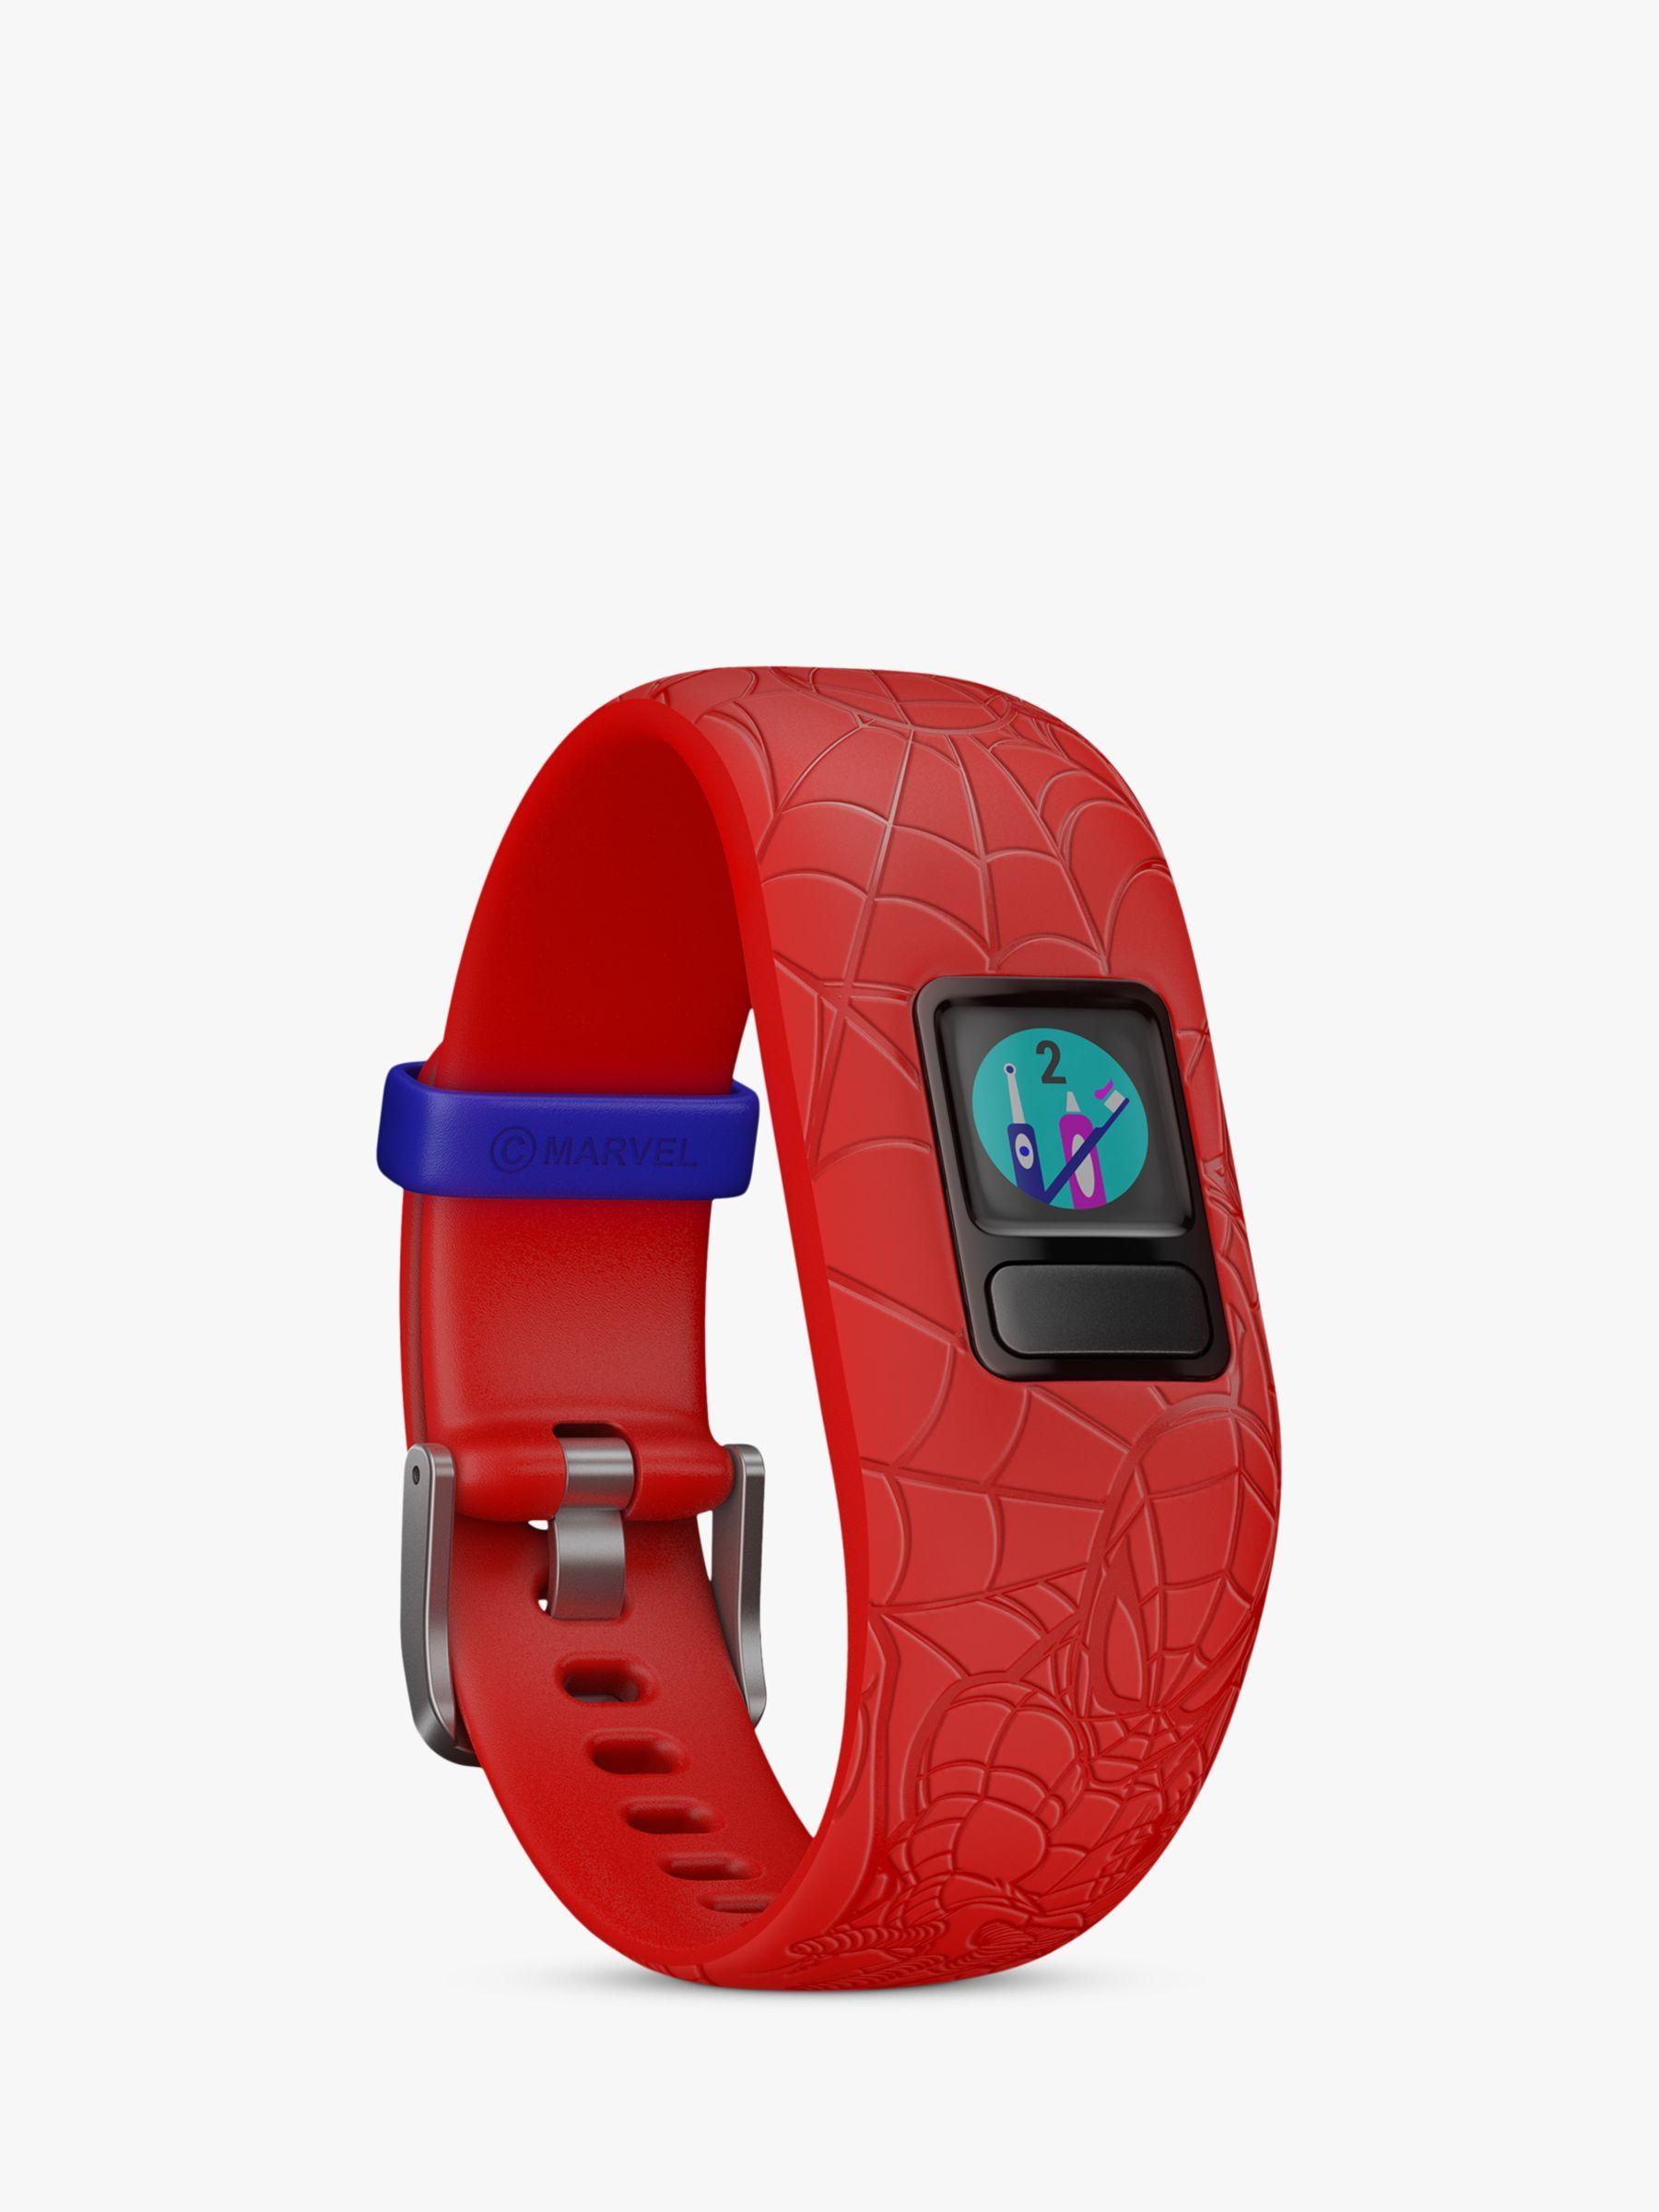 Garmin Garmin vivofit jr. 2, Adjustable Marvel Spider-Man Activity Tracker and Watch for Children